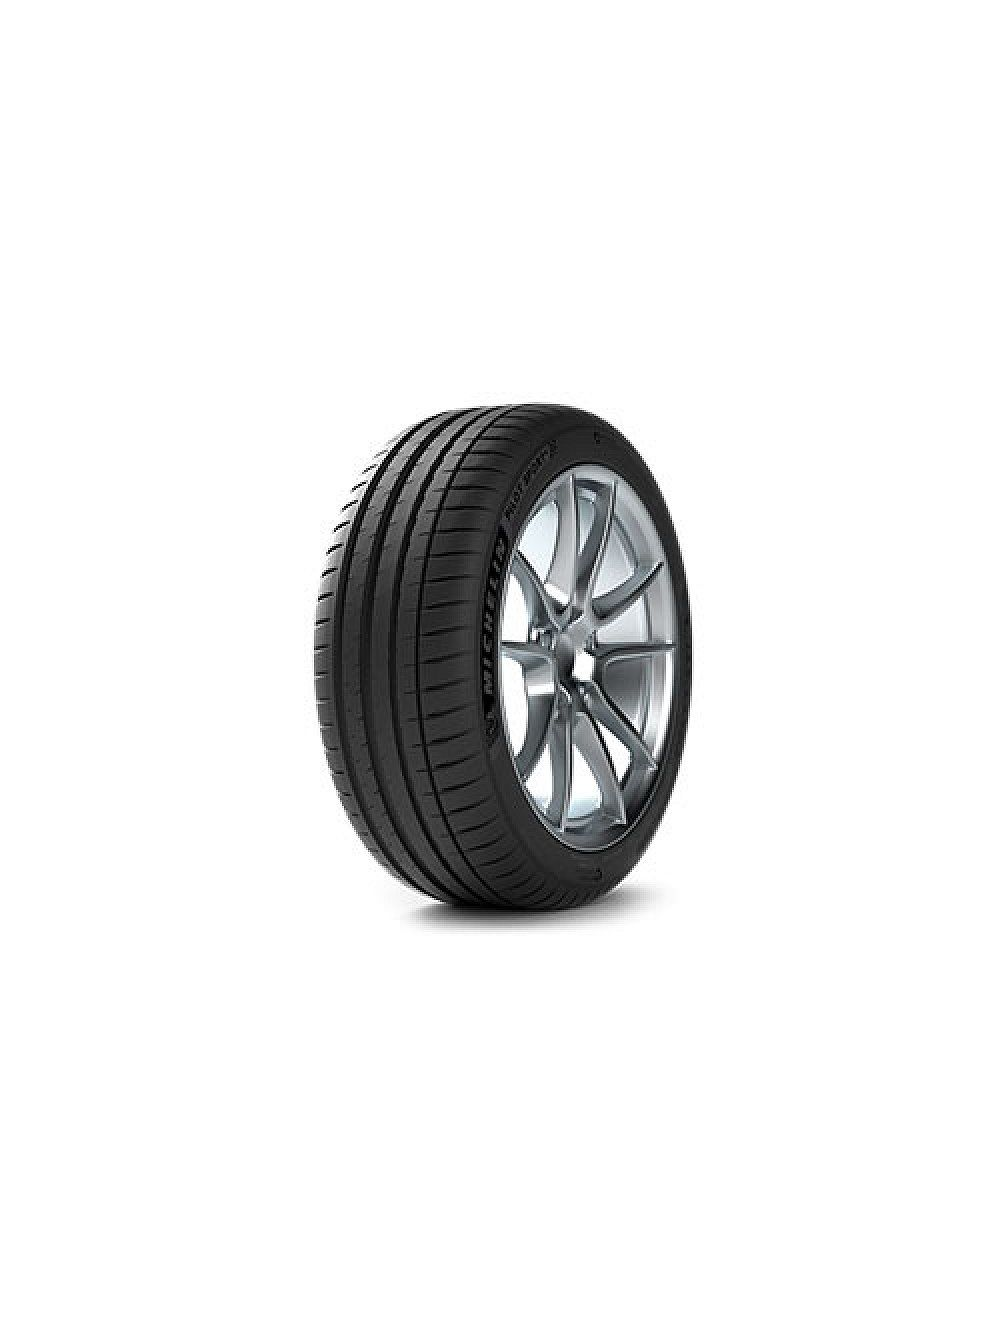 Michelin 245/35R20 Y Pilot Sport4 S XL K1 Nyári gumi